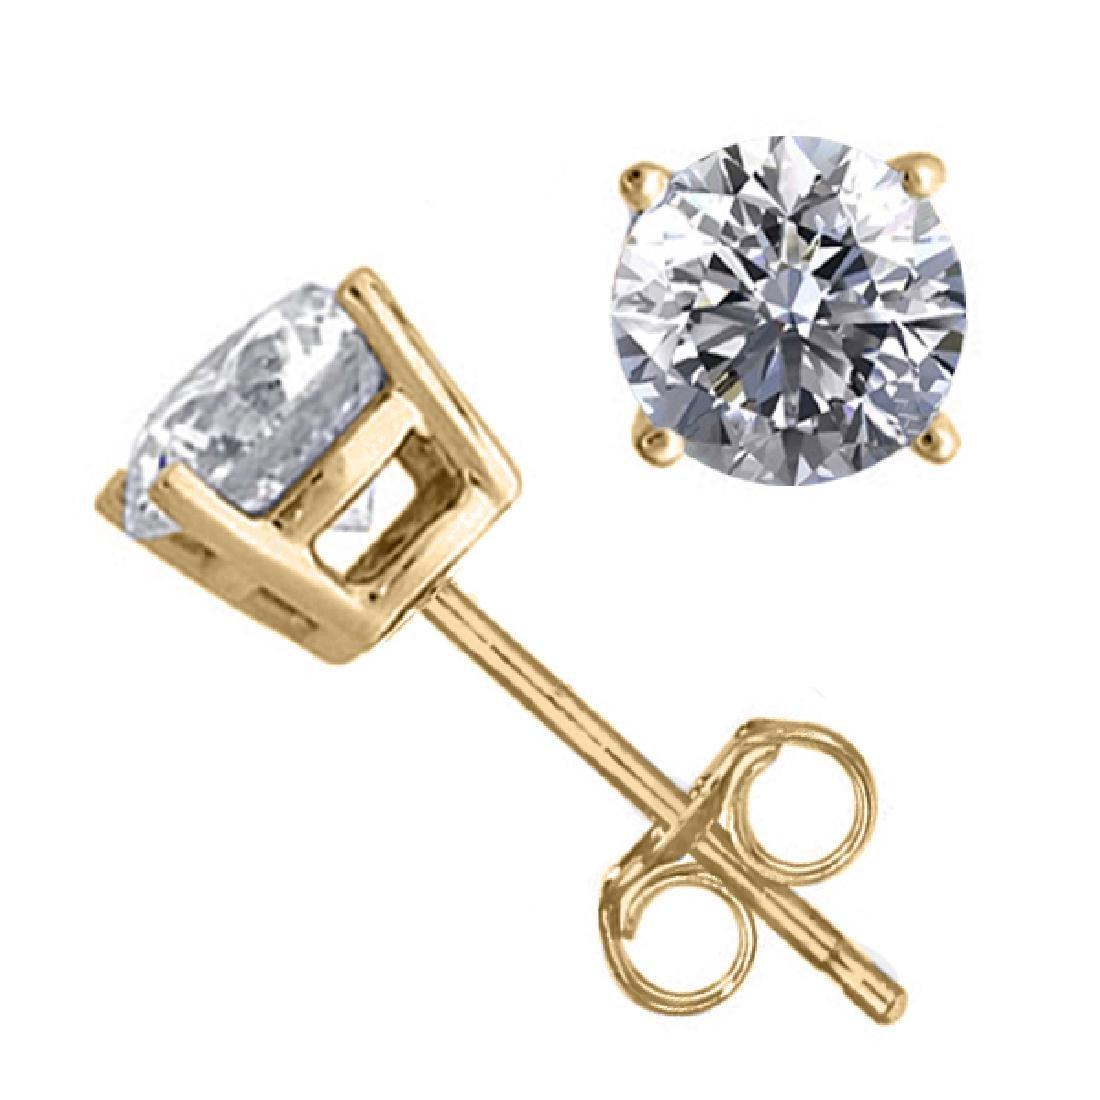 14K Yellow Gold Jewelry 1.04 ctw Natural Diamond Stud